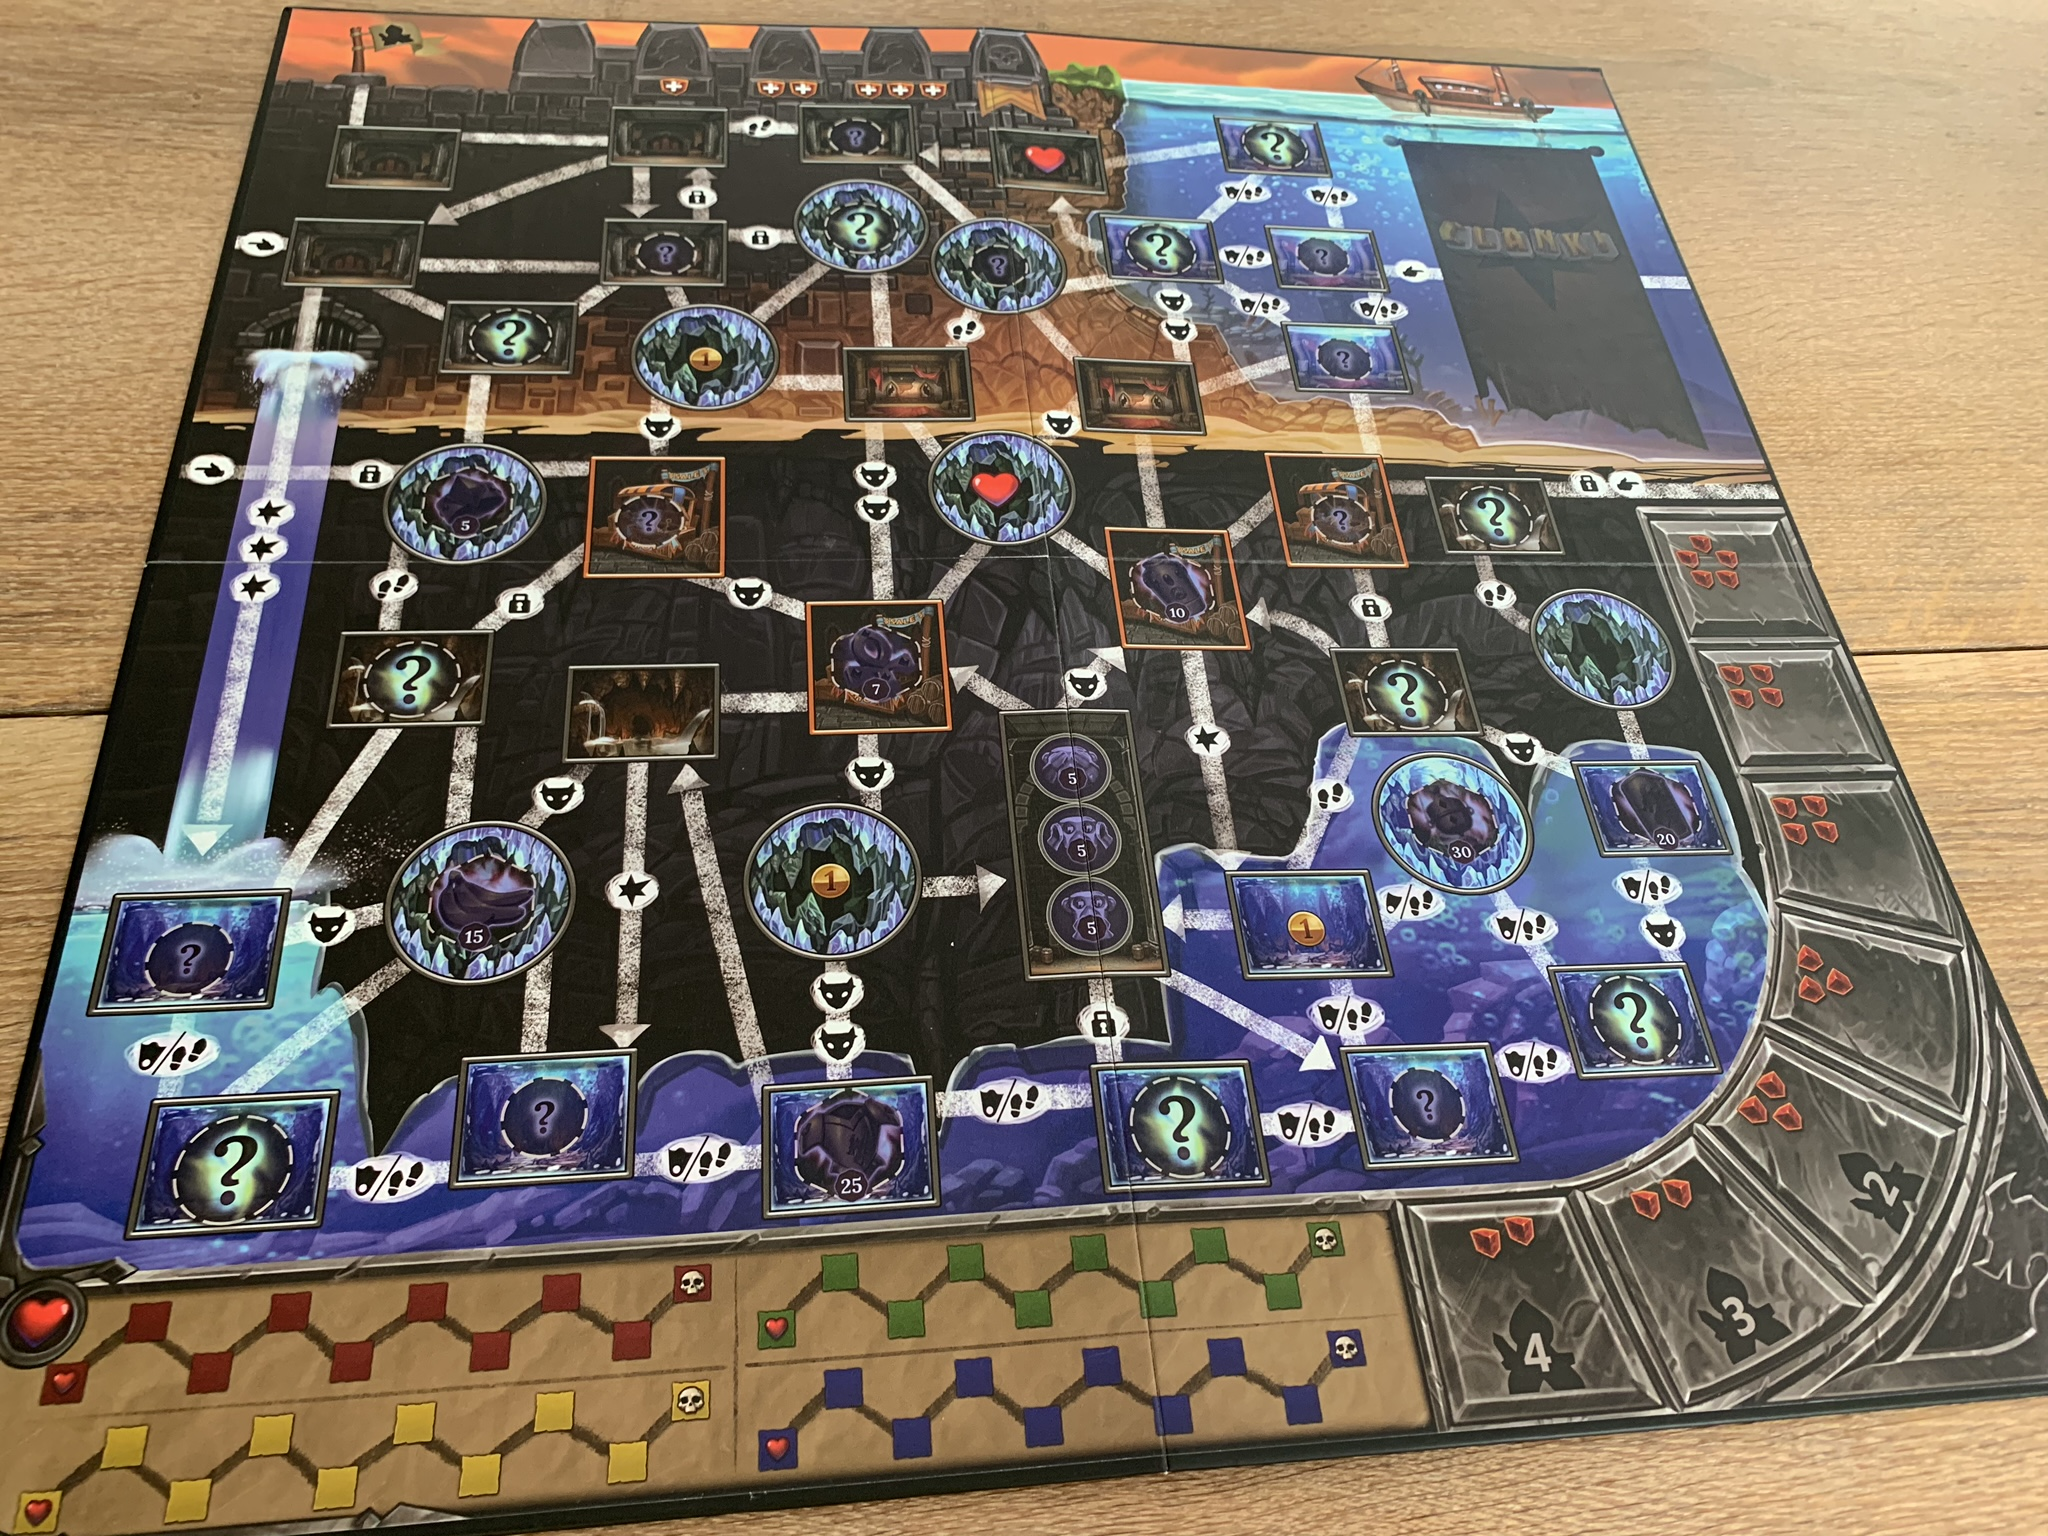 Clank!: Sunken Treasures - game board 2 side